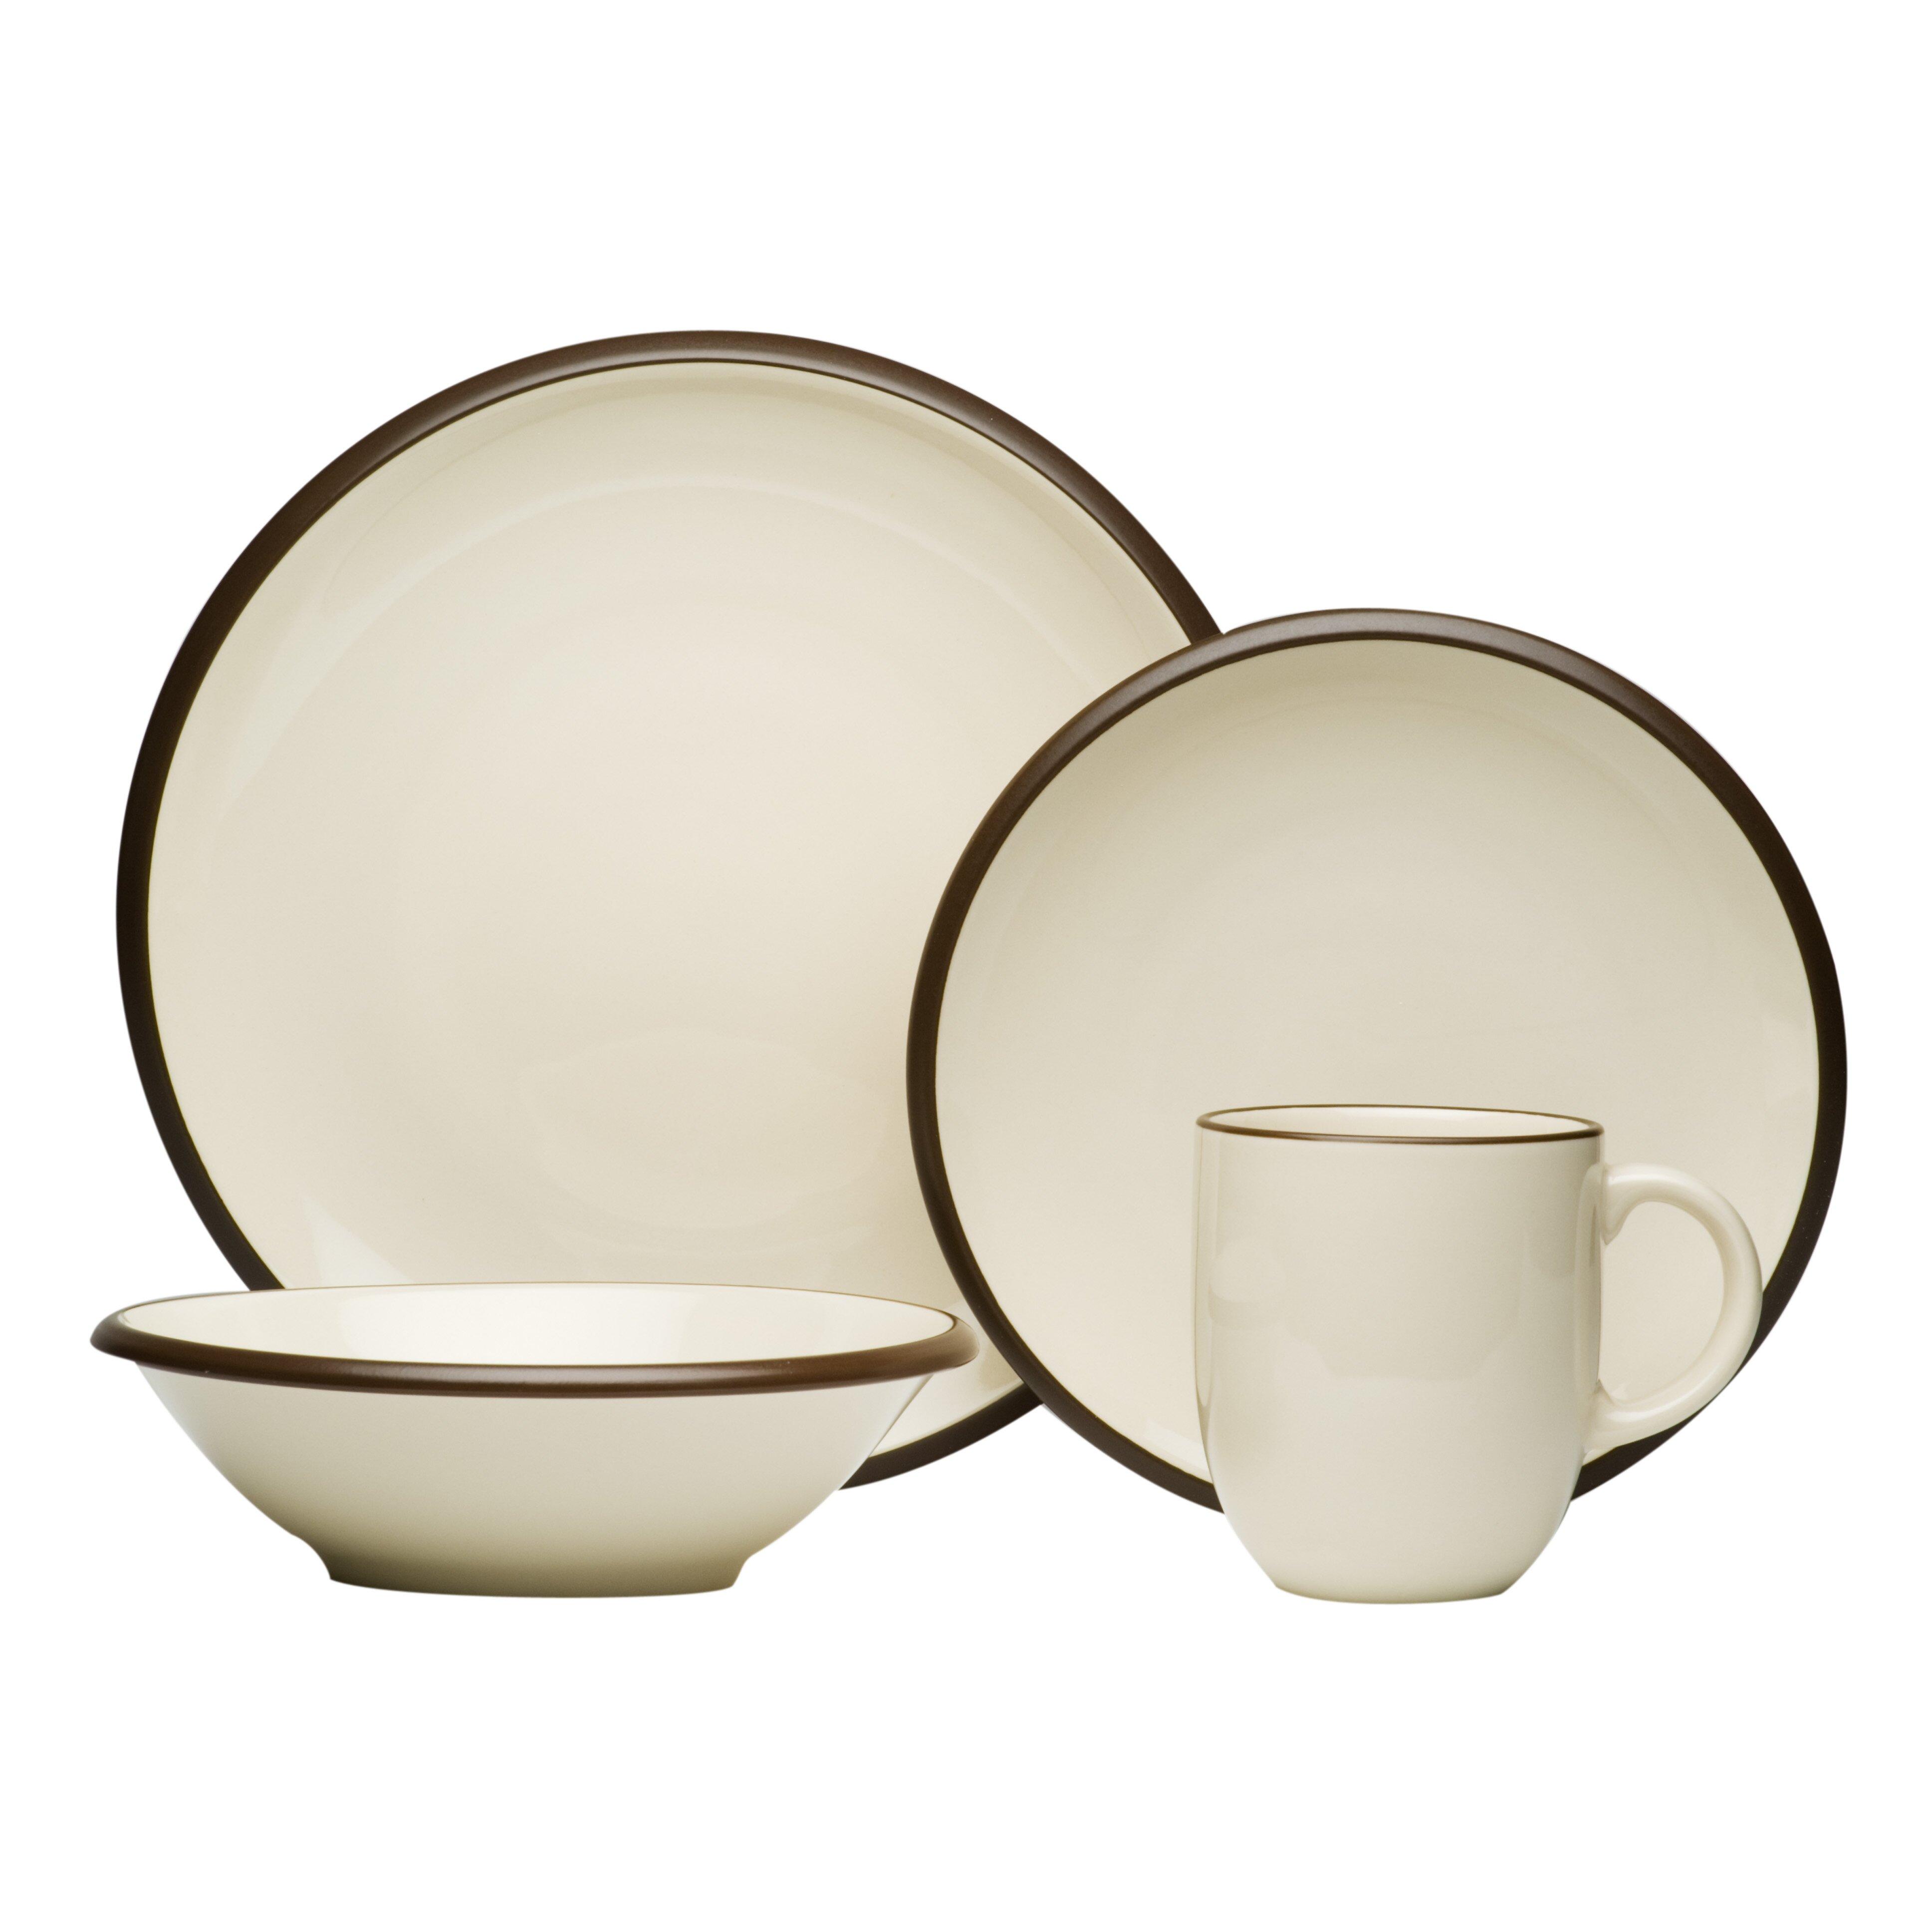 16 Piece Hampshire Dinnerware Set